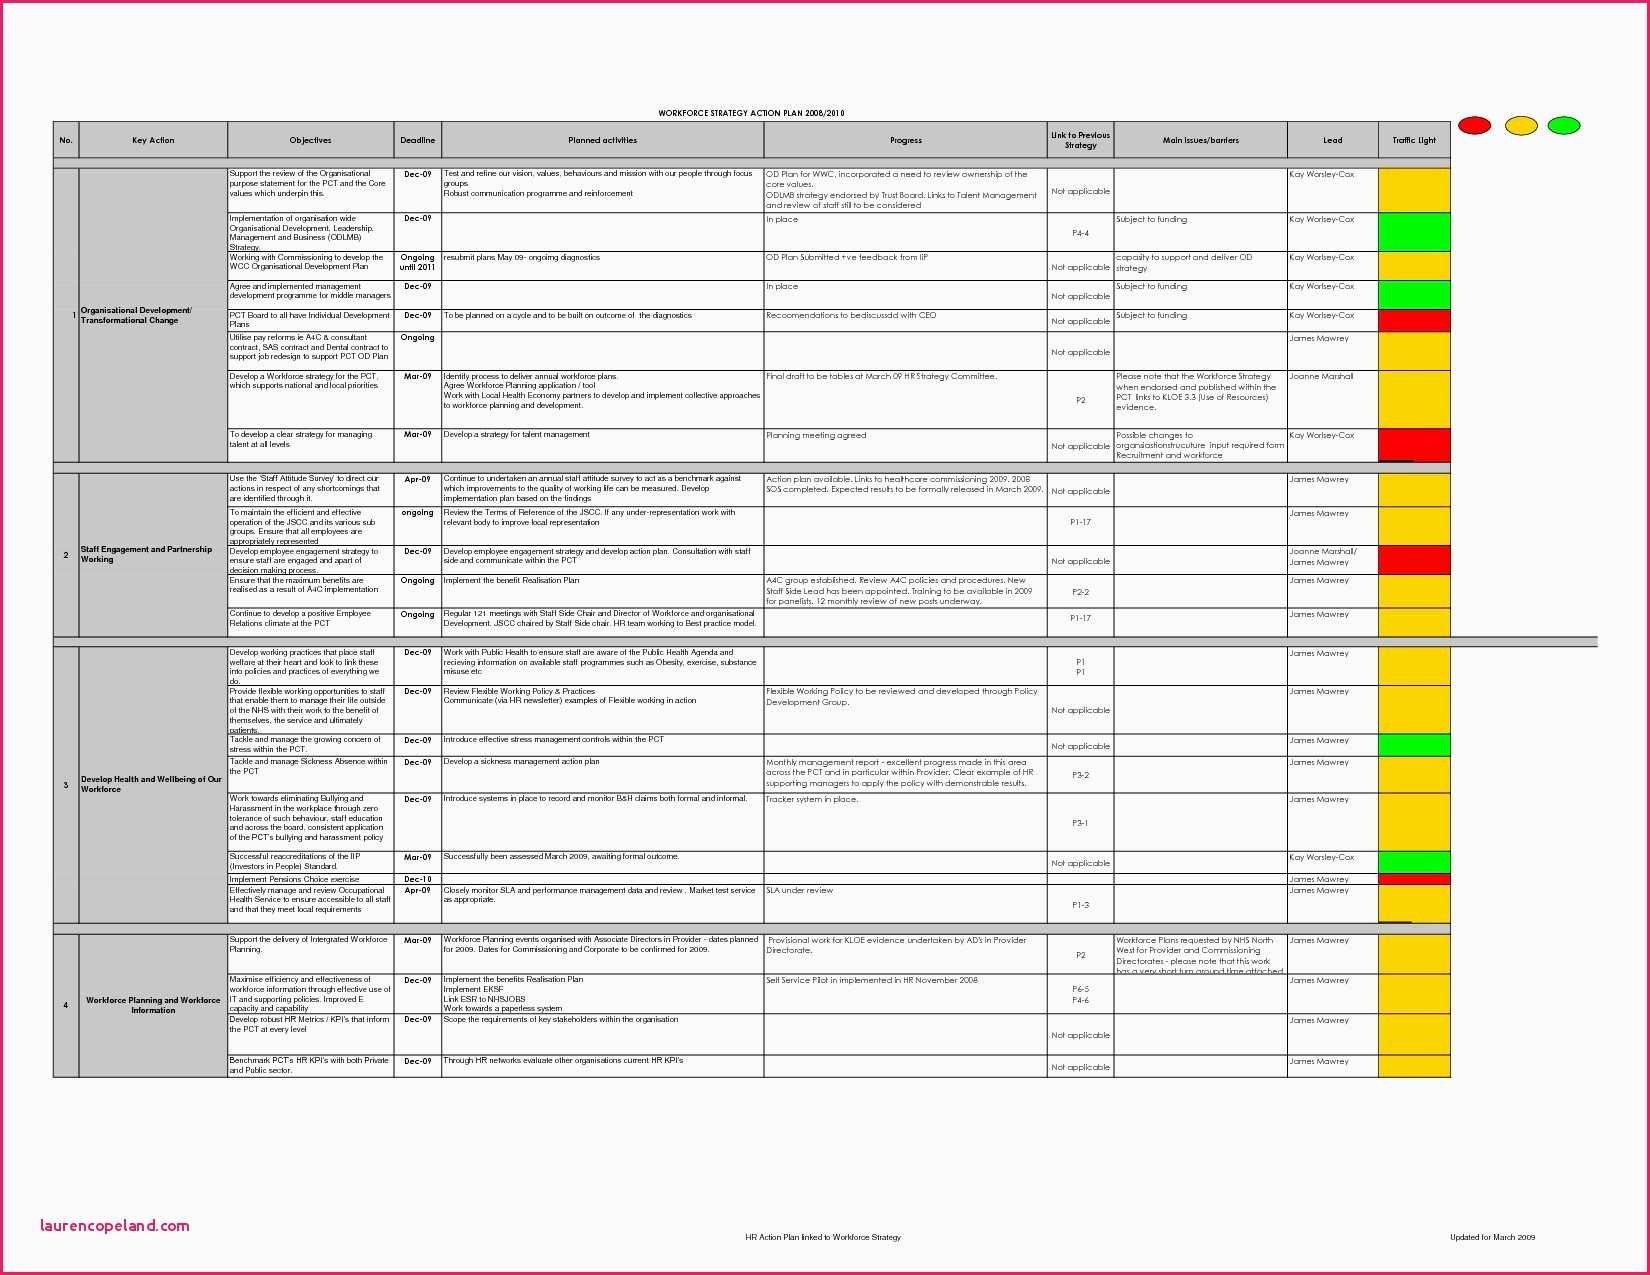 Car Service Labels Lovely Omobil Produktion Hersteller Wirtschaft With Inventory Labels Template